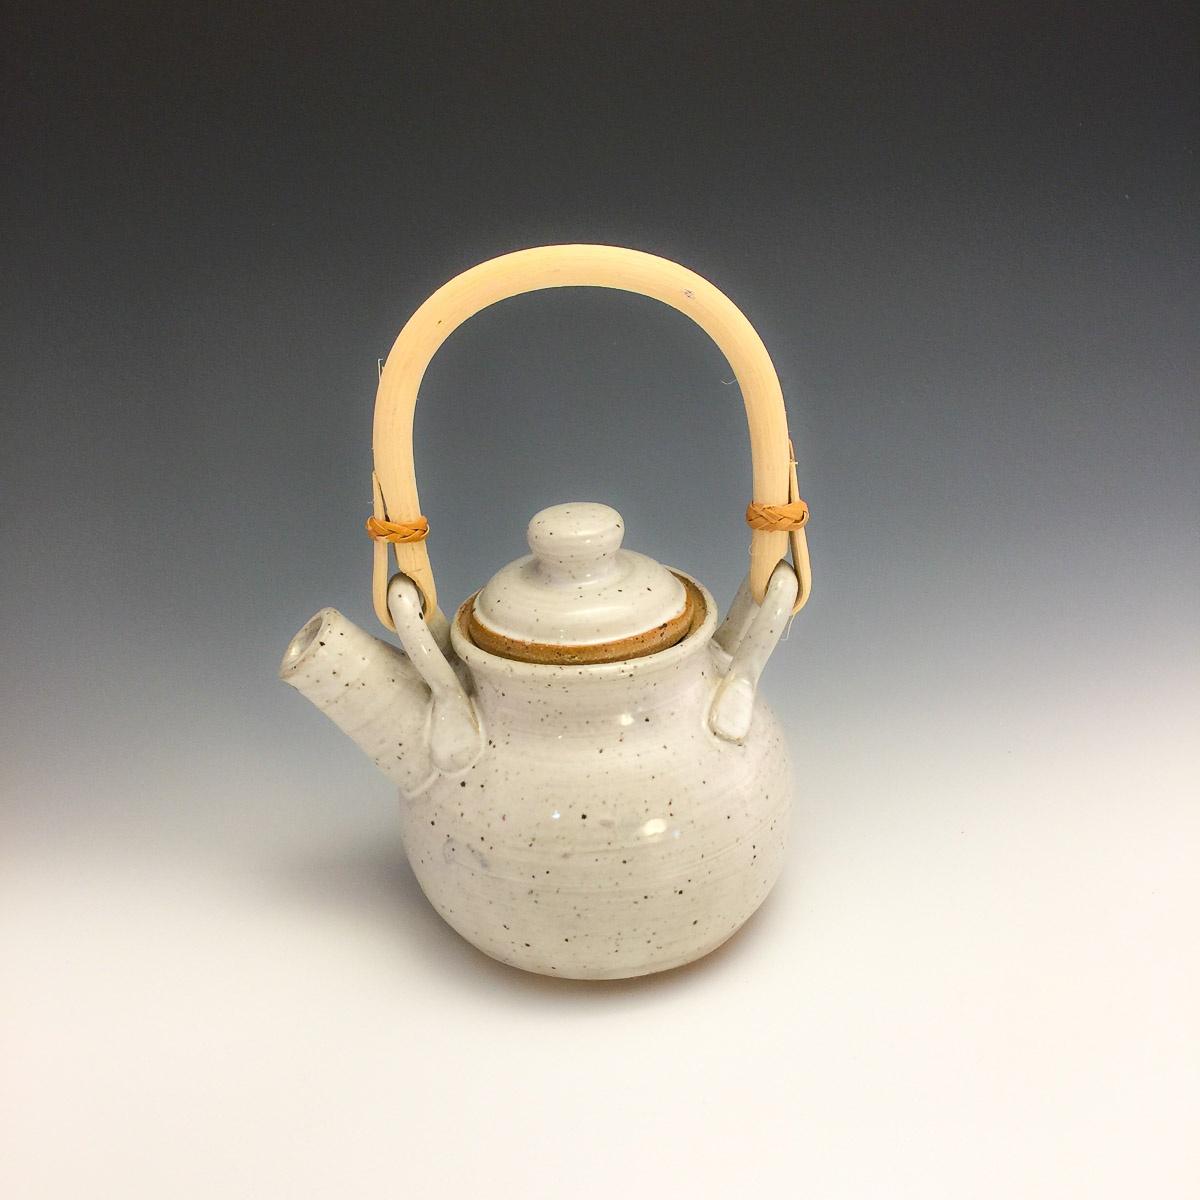 Teapot, Small